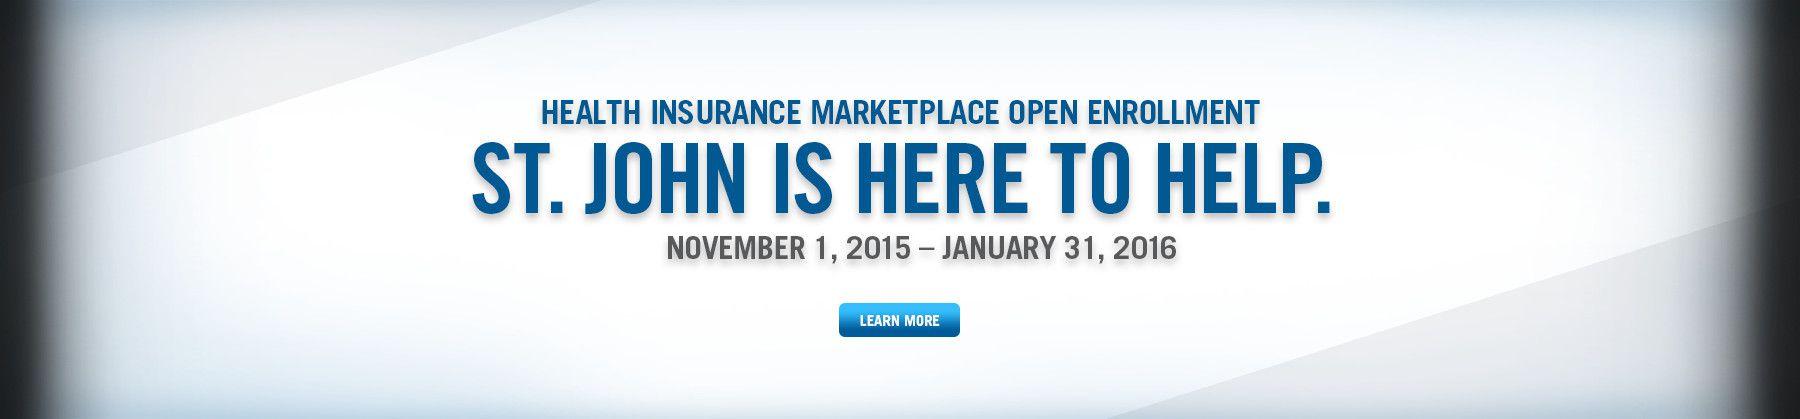 Healthcare Insurance Marketplace 2015